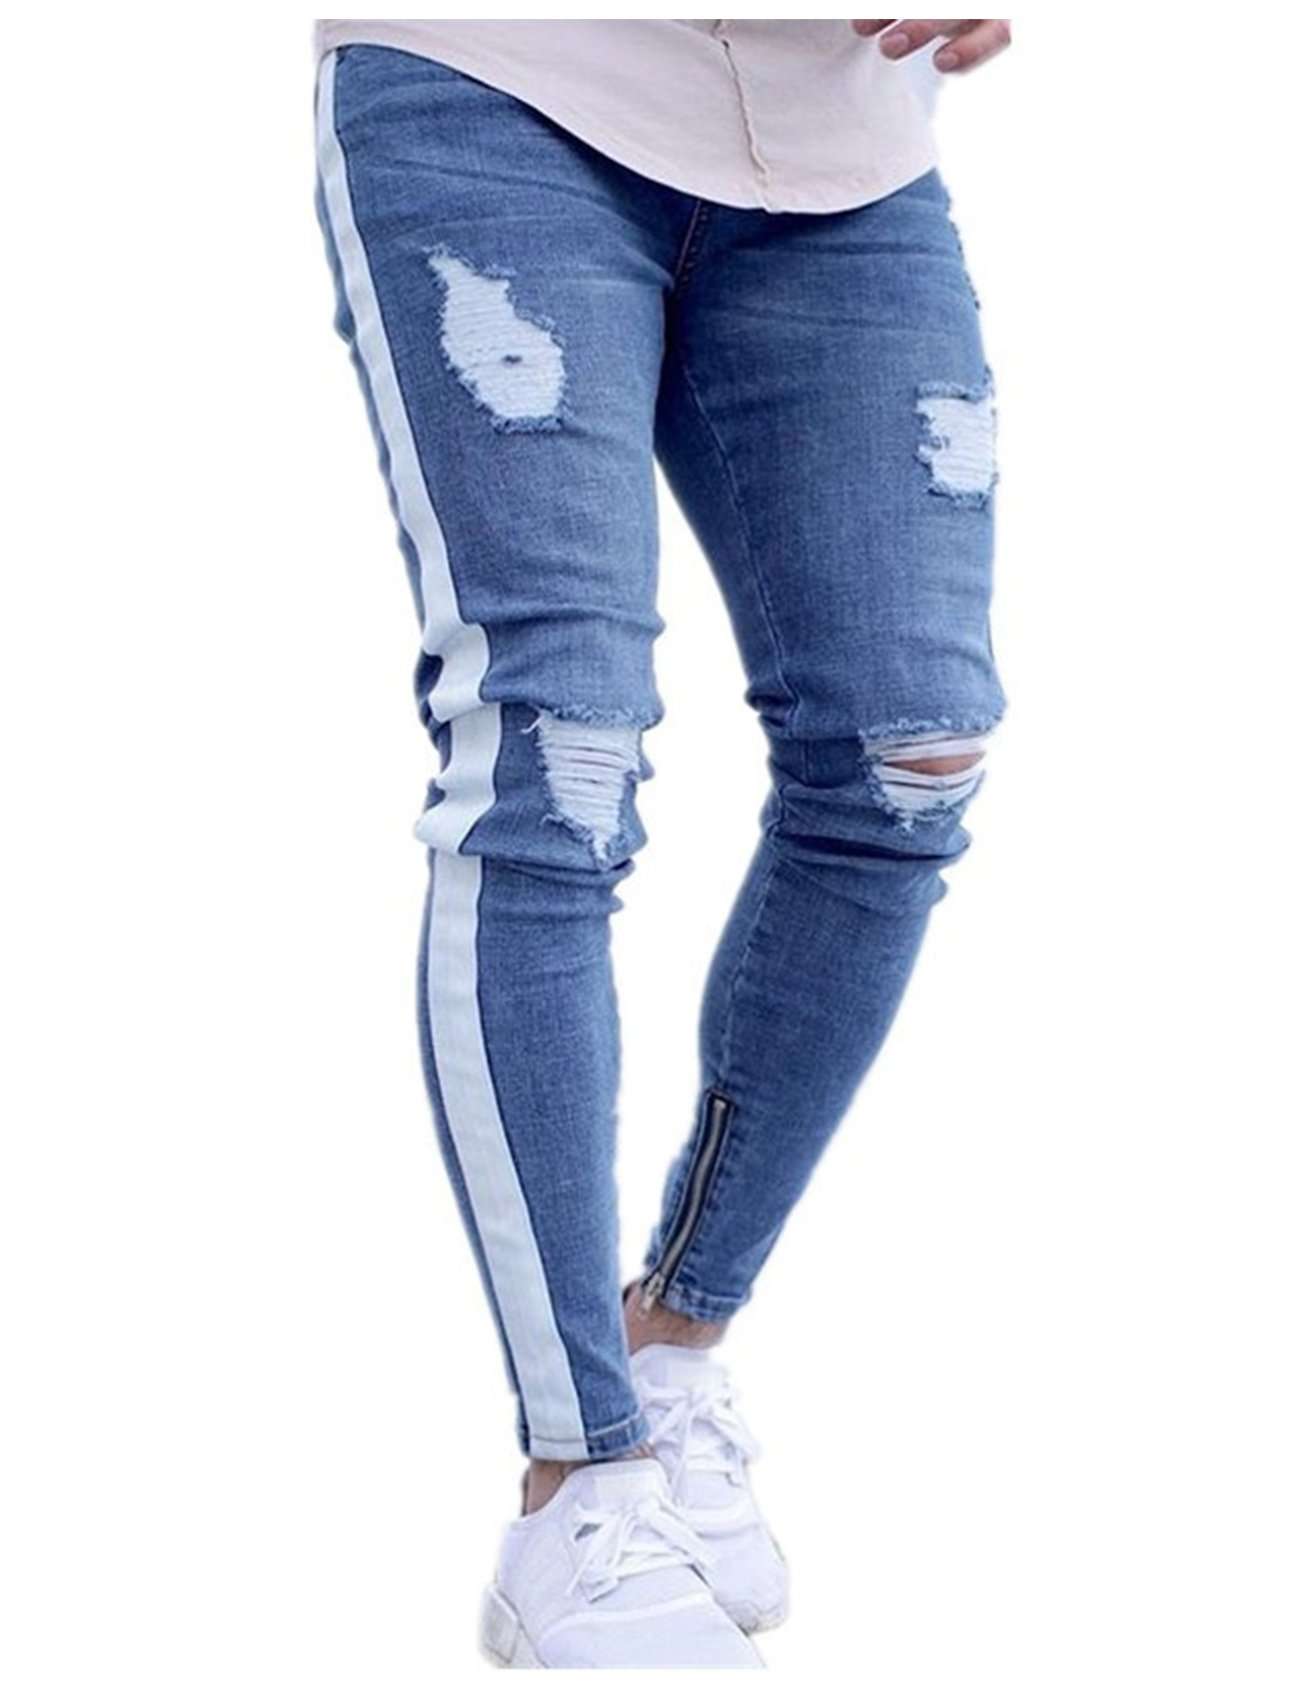 Bestgift Men's Stretch Side Stripe Zipper Decor Distressed Jeans S Light Blue